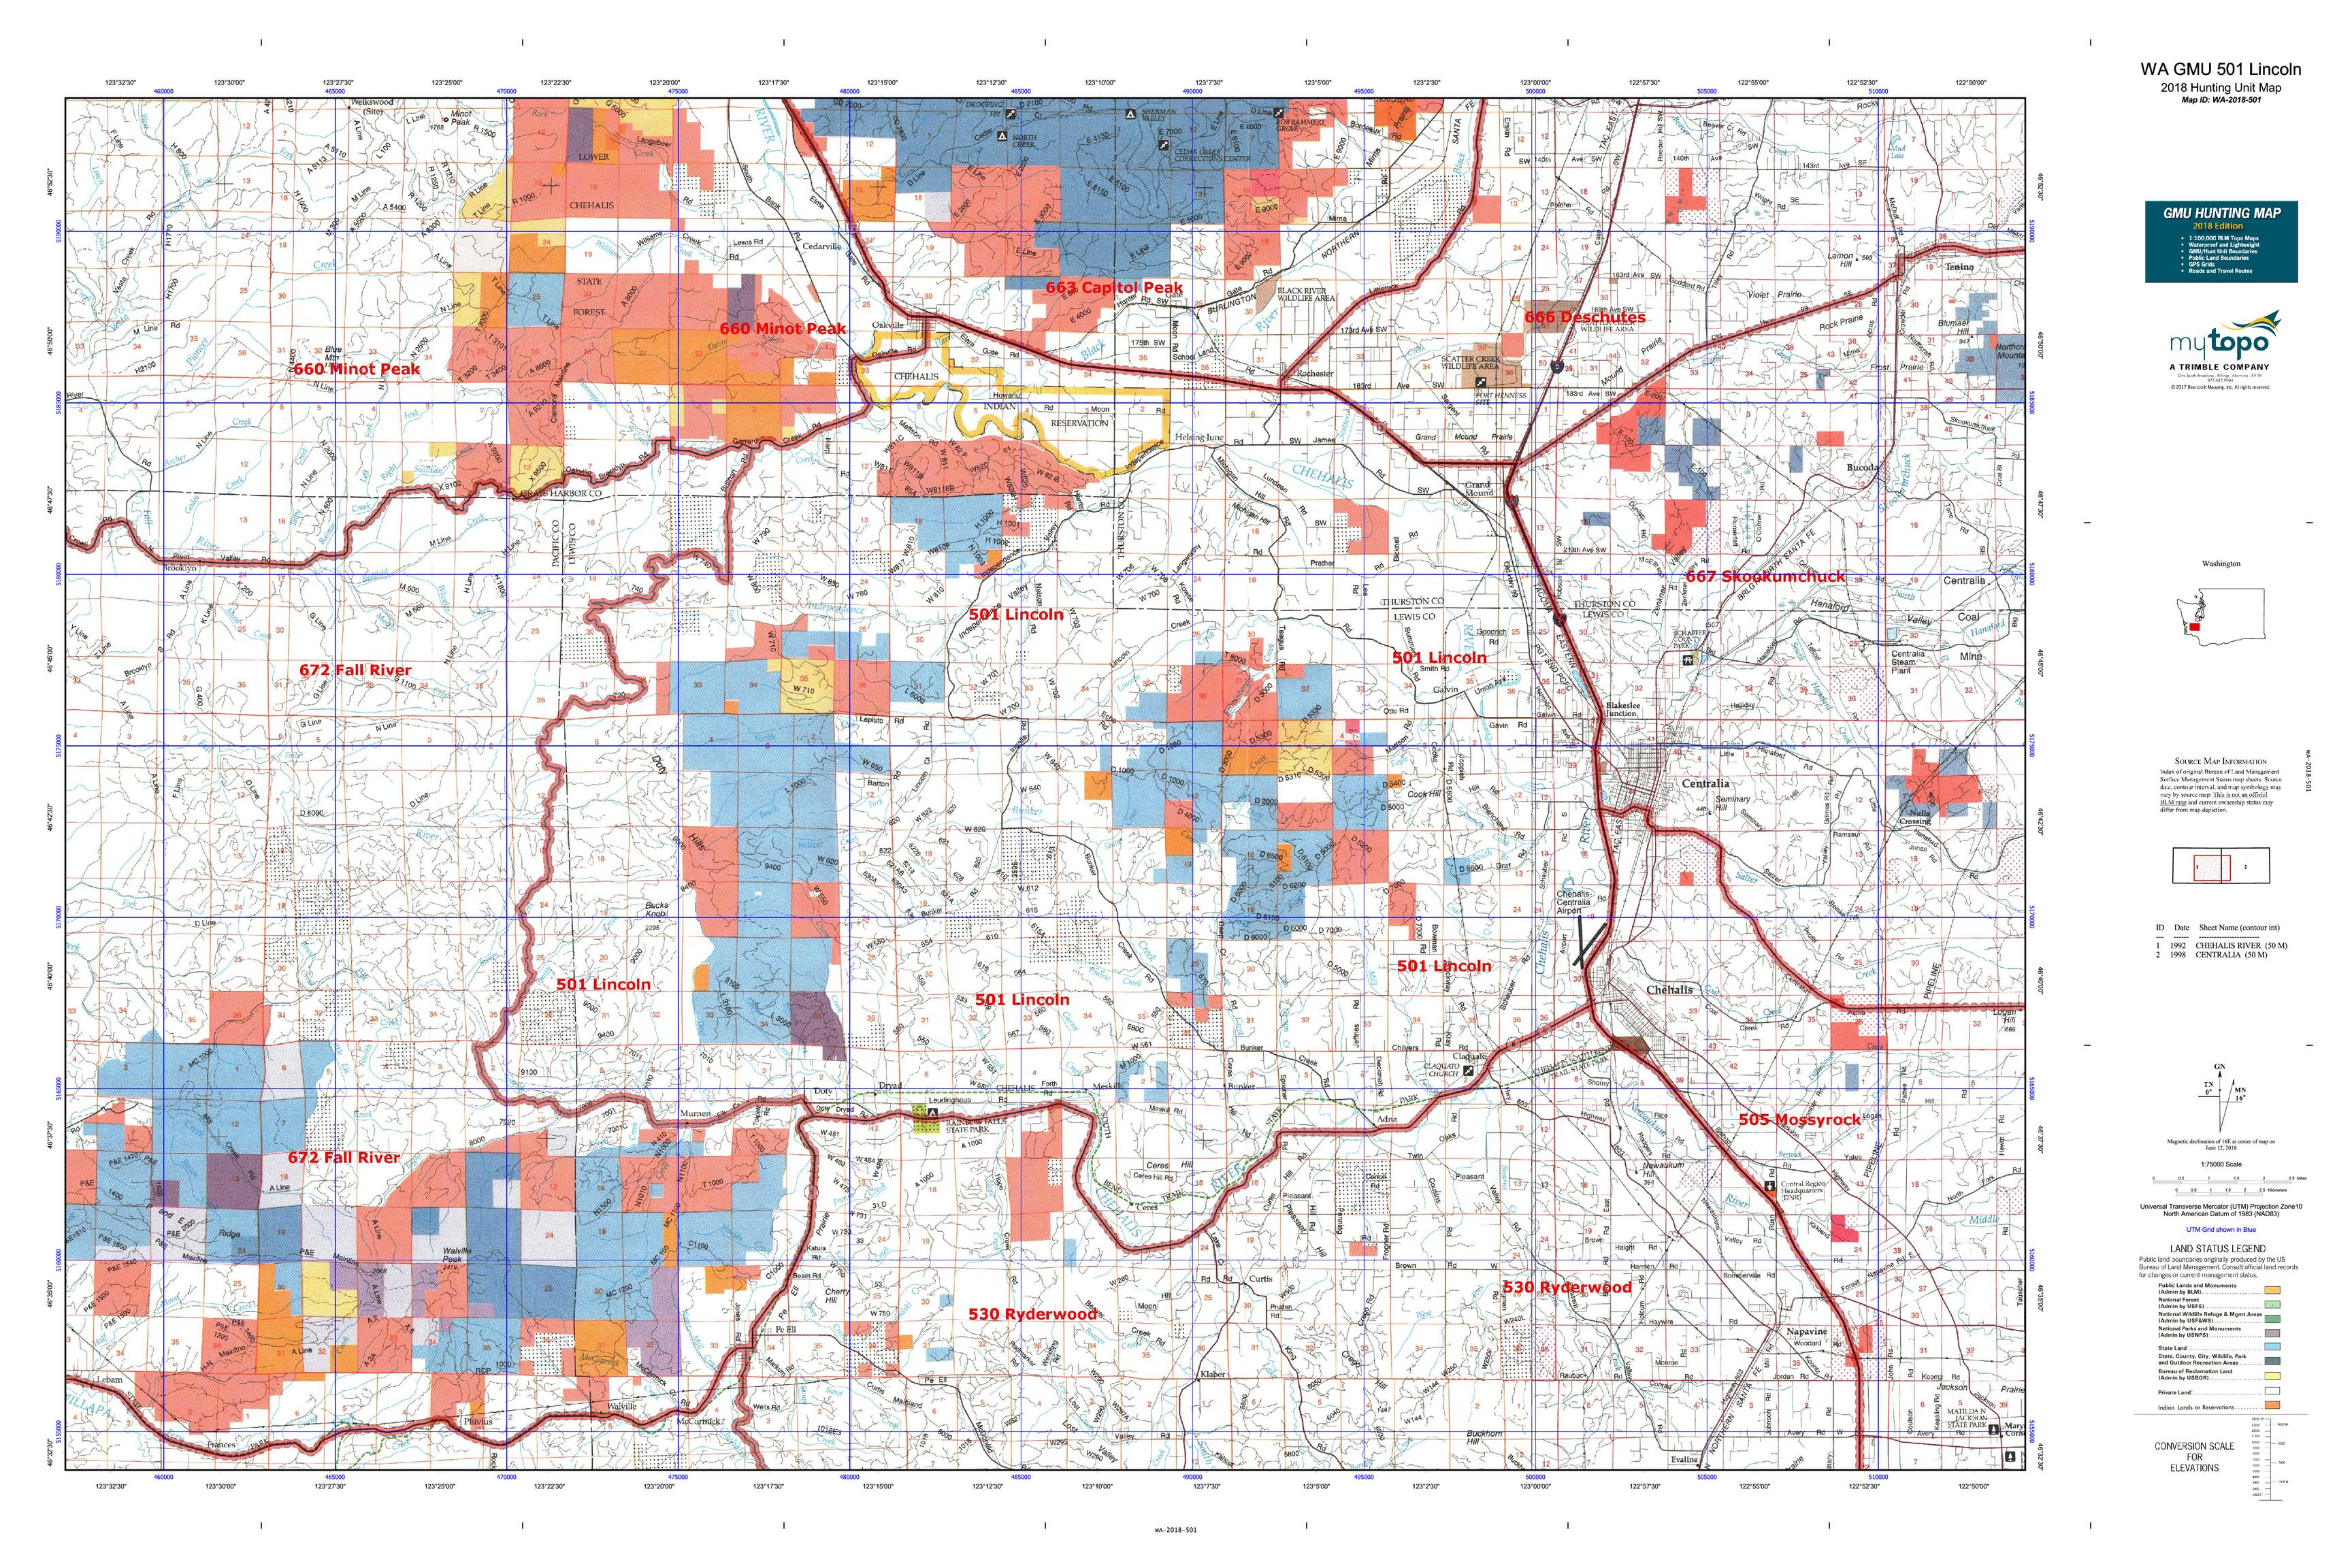 WA GMU 501 Lincoln Map | MyTopo